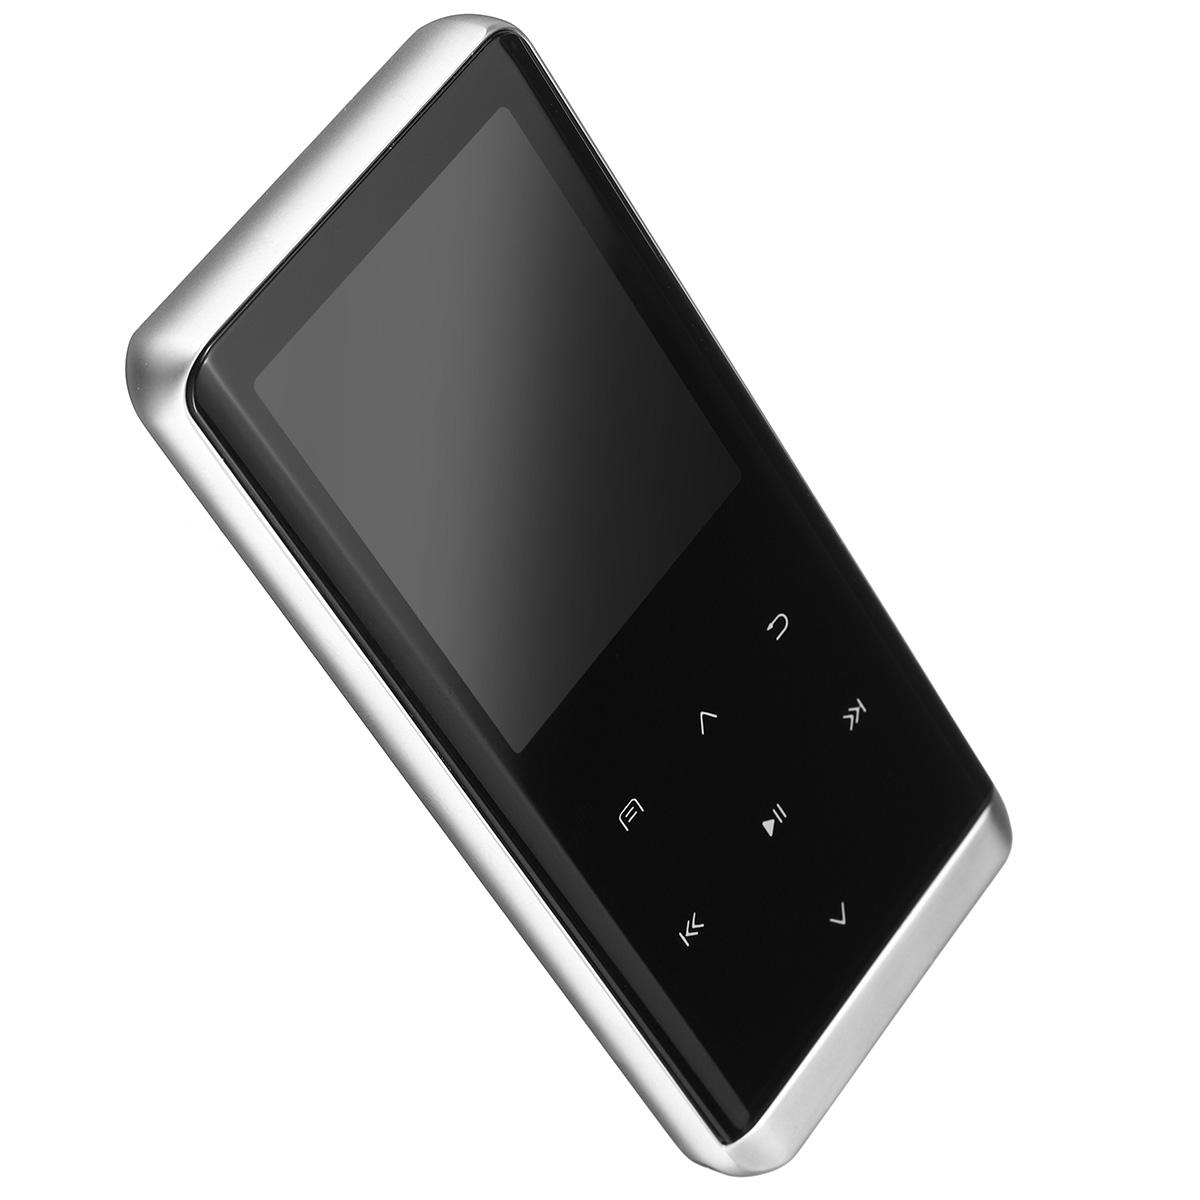 JNN M13 bluetooth Lossless MP3 Player MP4 Audio Video Music Player FM Radio E-book